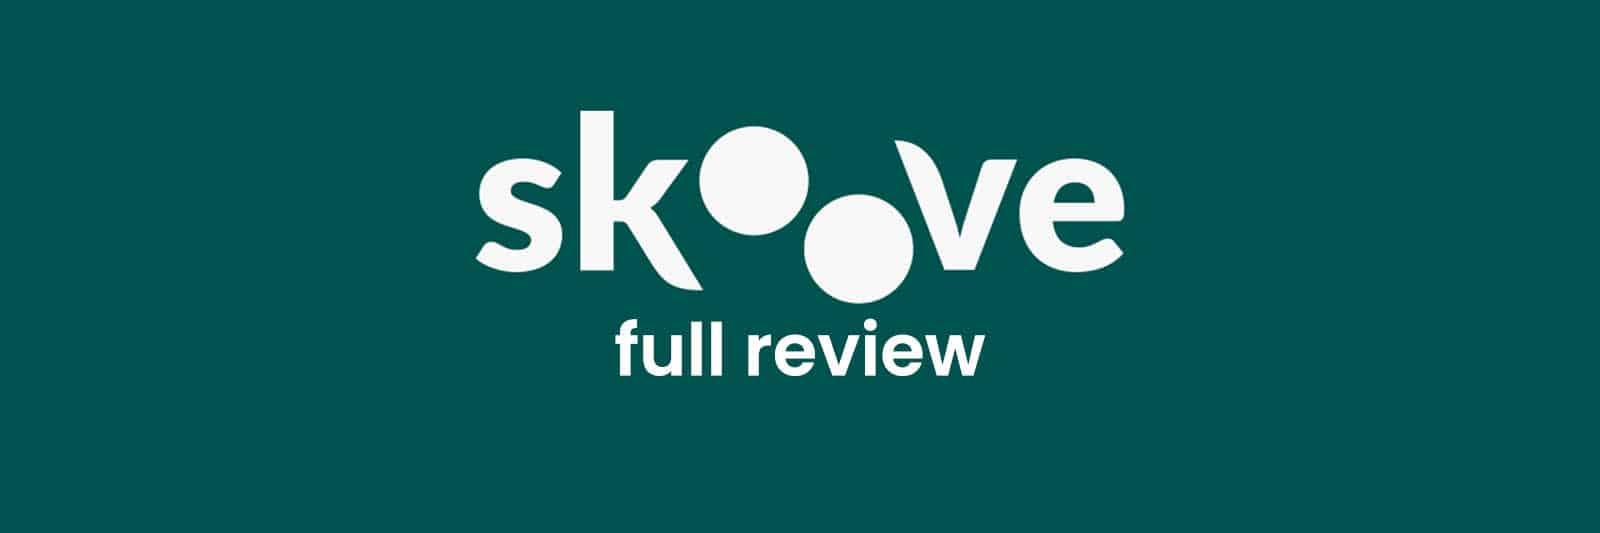 skoove-review